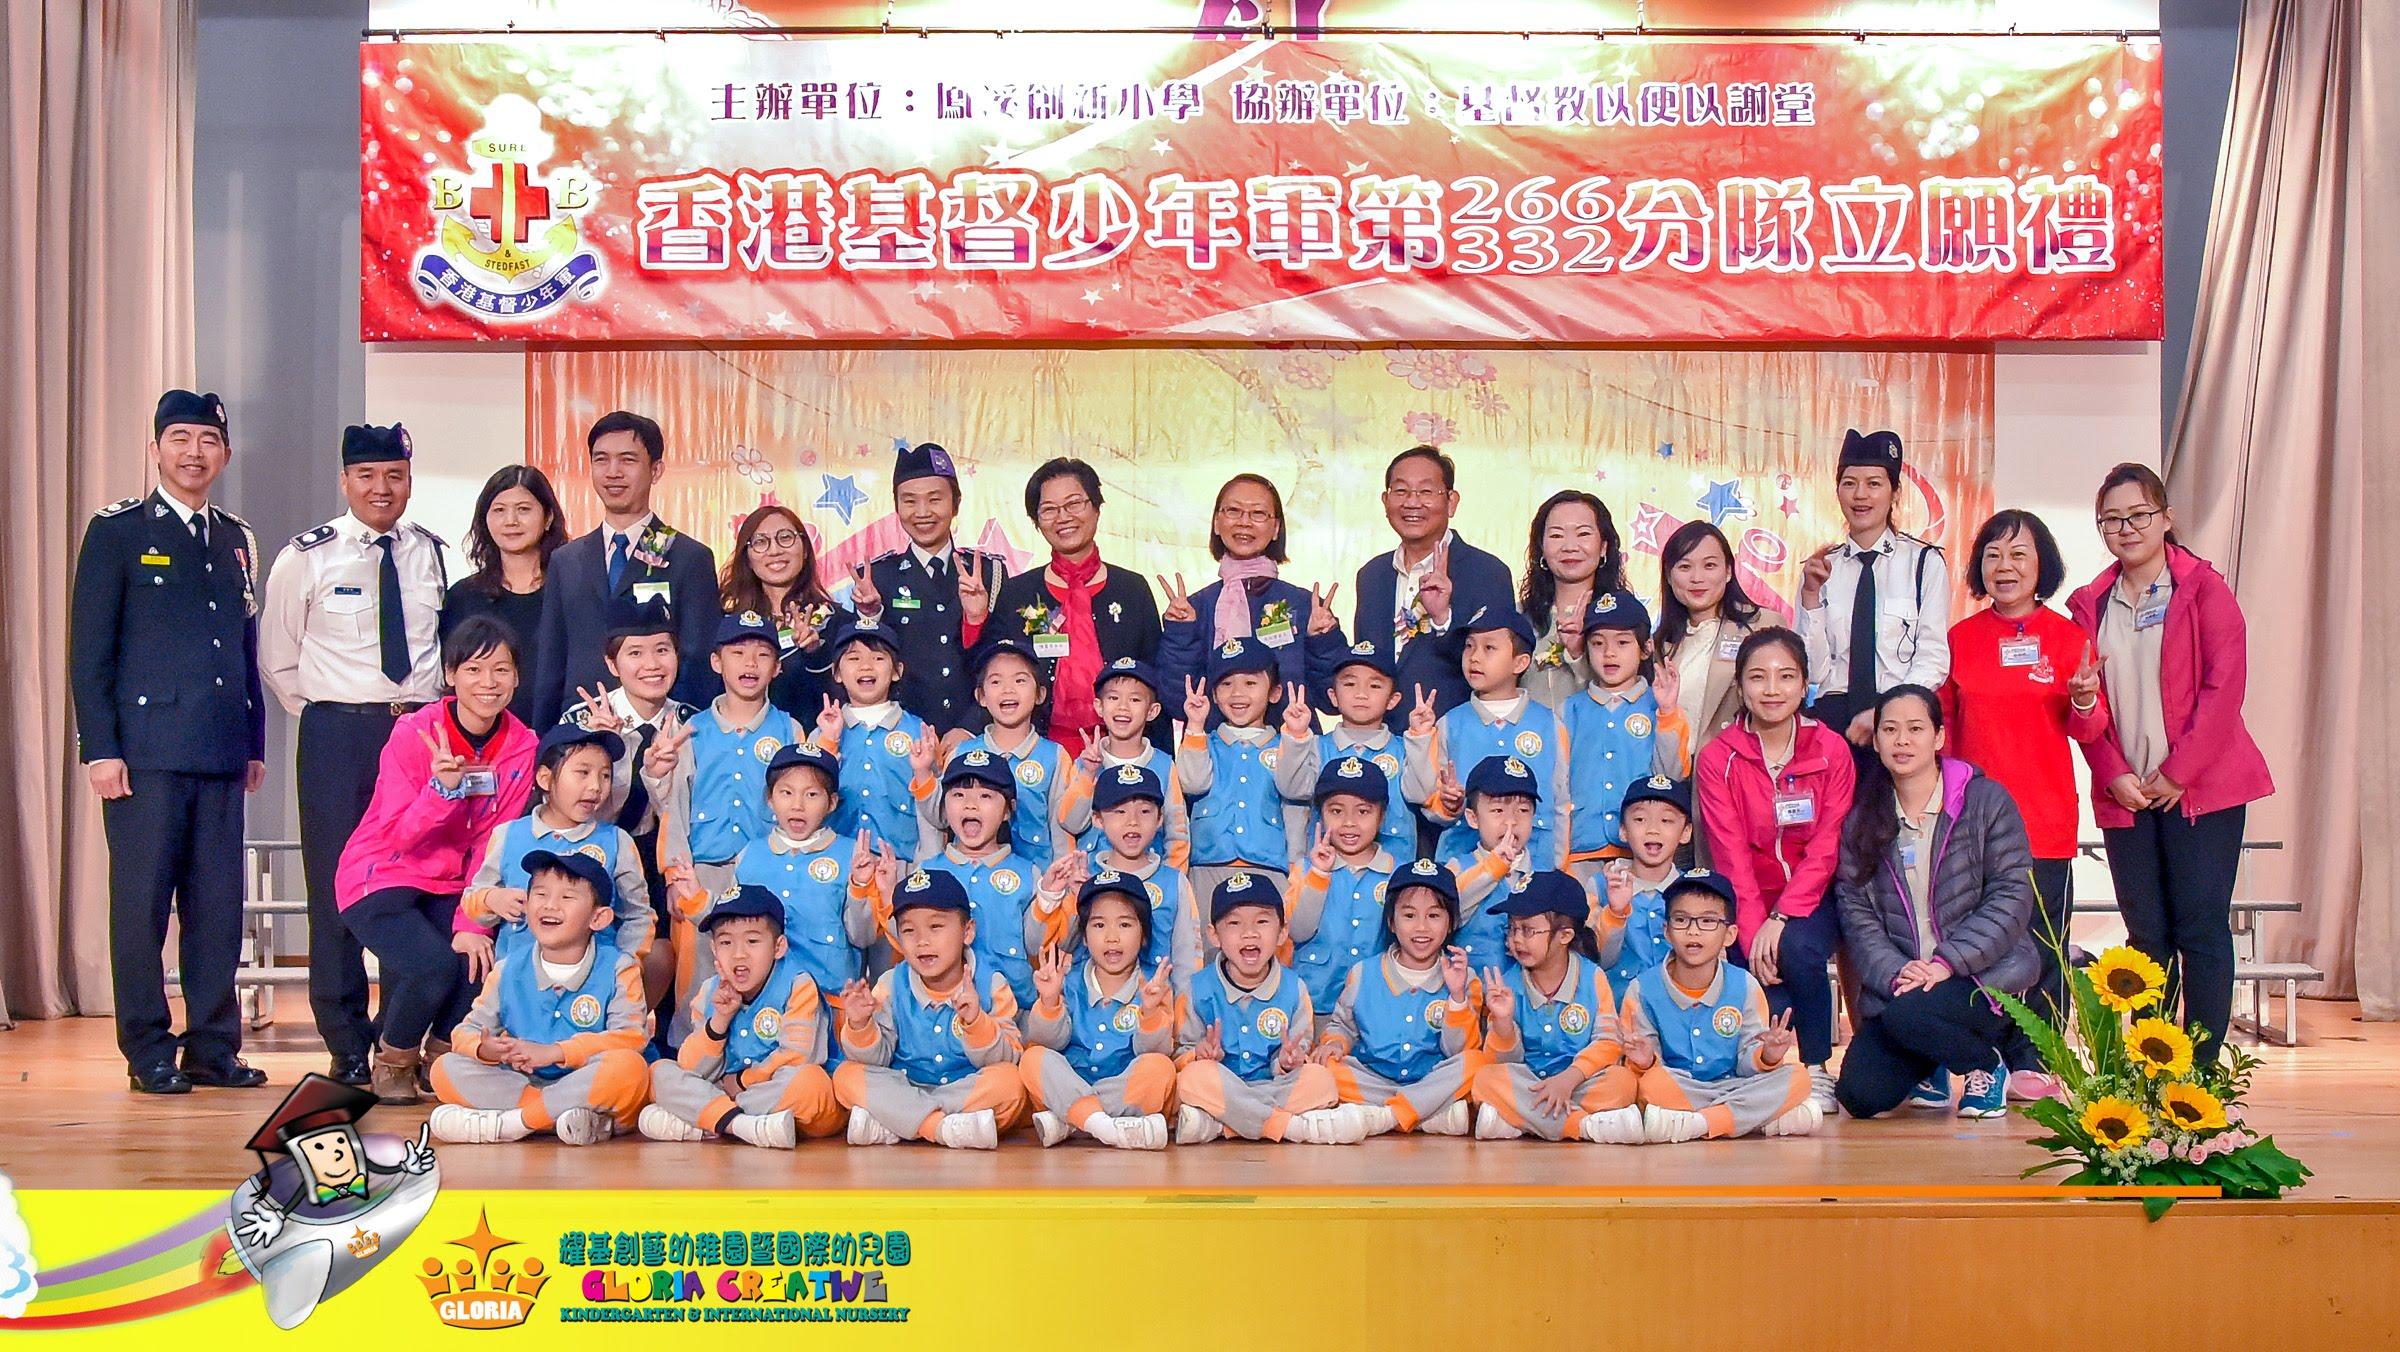 Photo of 【花絮】香港基督少年軍「小綿羊332分隊」立願禮